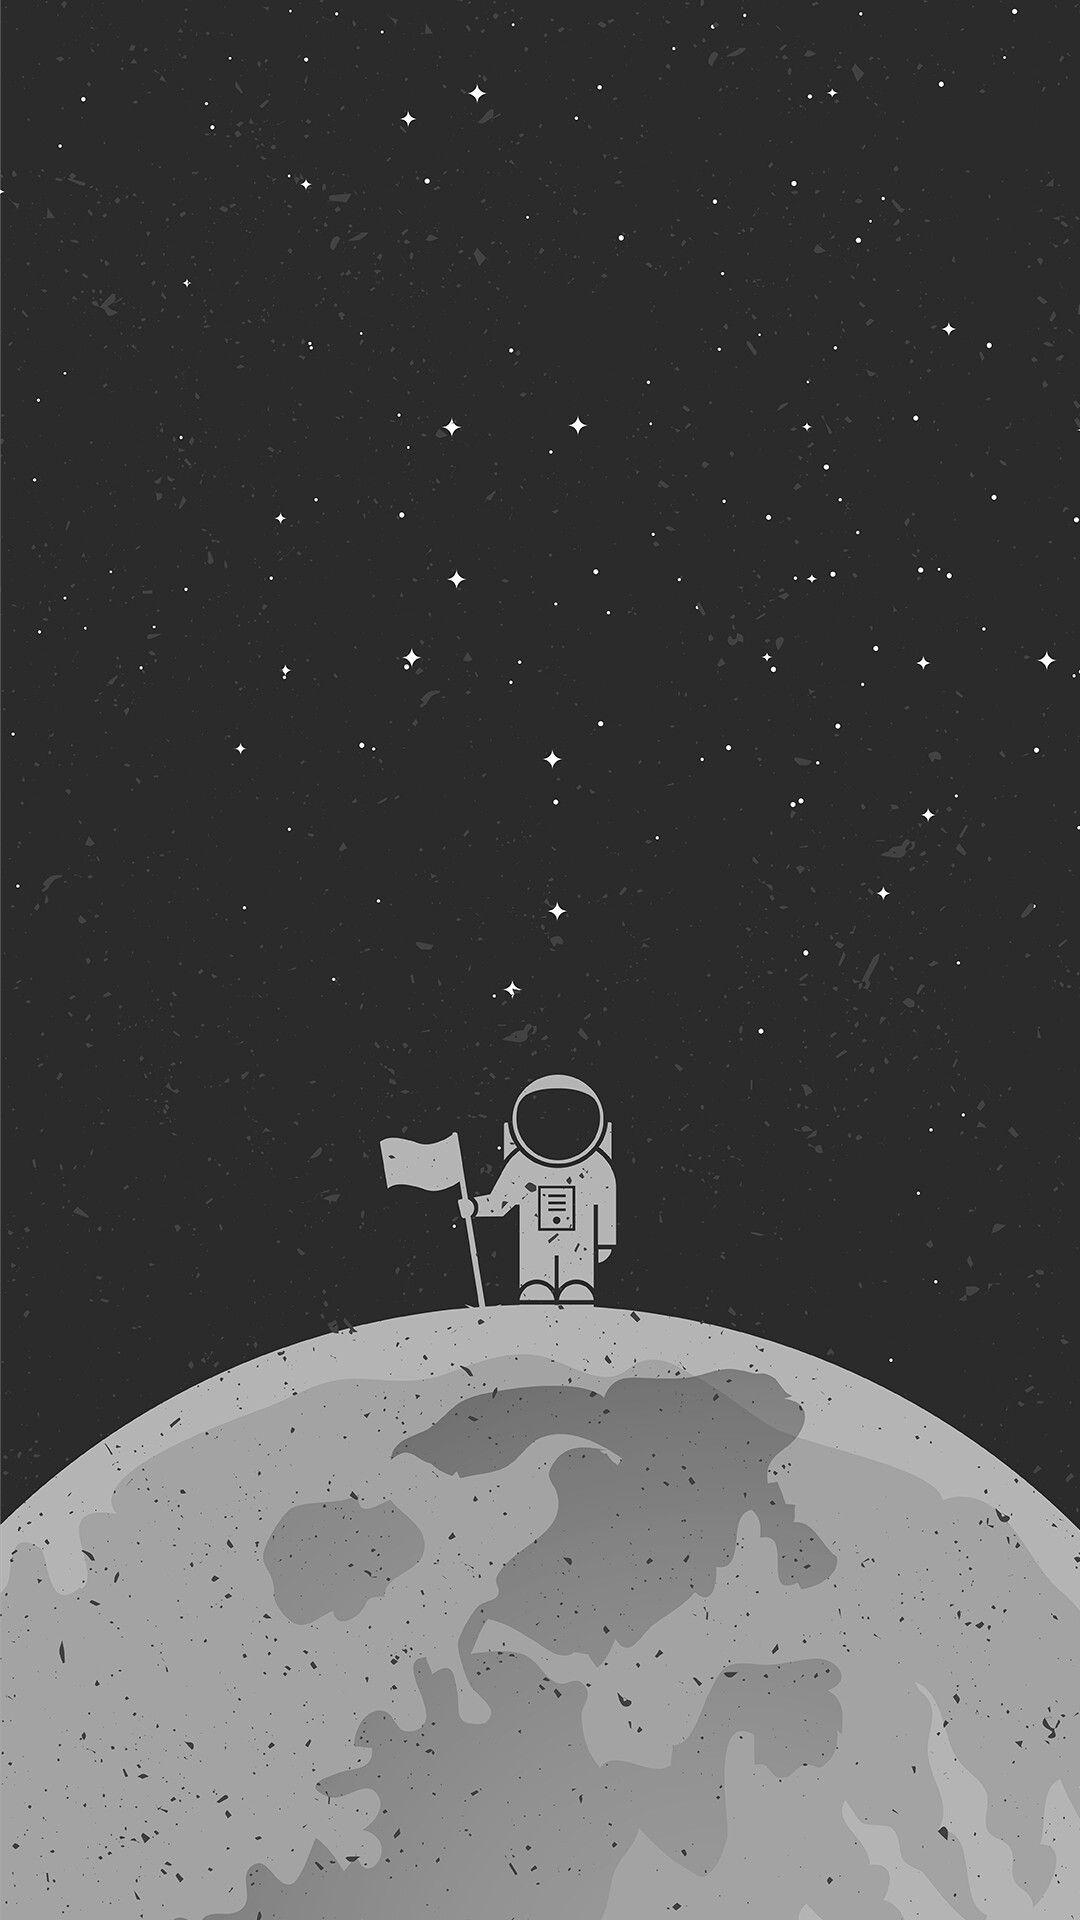 Man On The Moon Kertas Dinding Abstrak